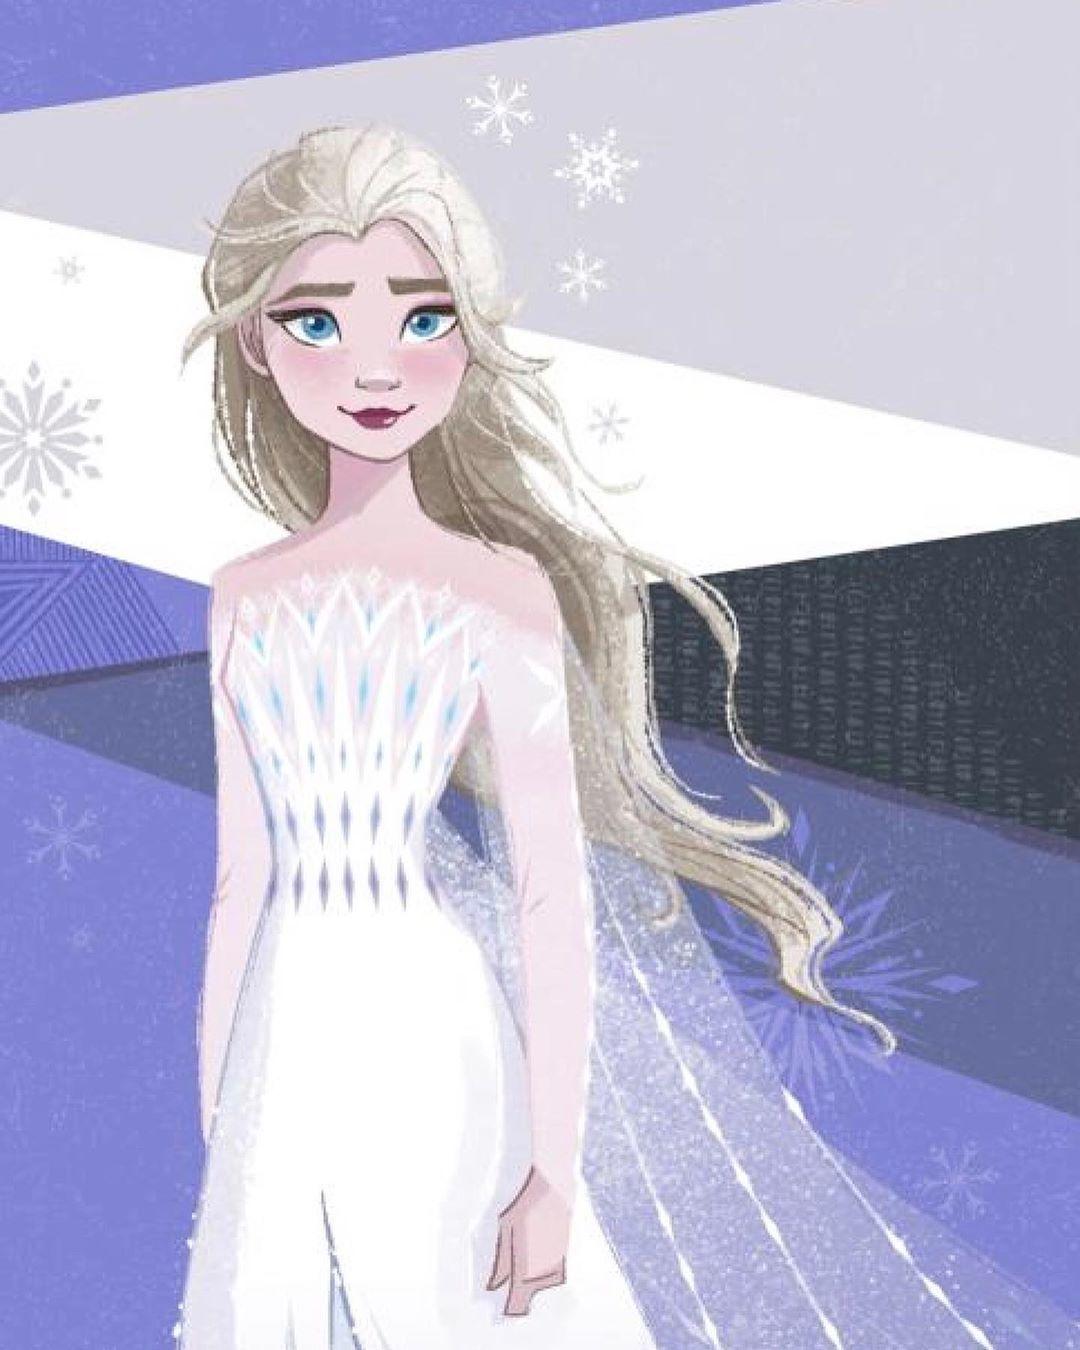 1080x1920 Snow Queen Elsa Frozen 2 Beautiful Queen Wallpaper Disney Princess Wallpaper Frozen Wallpaper Disney Princess Elsa